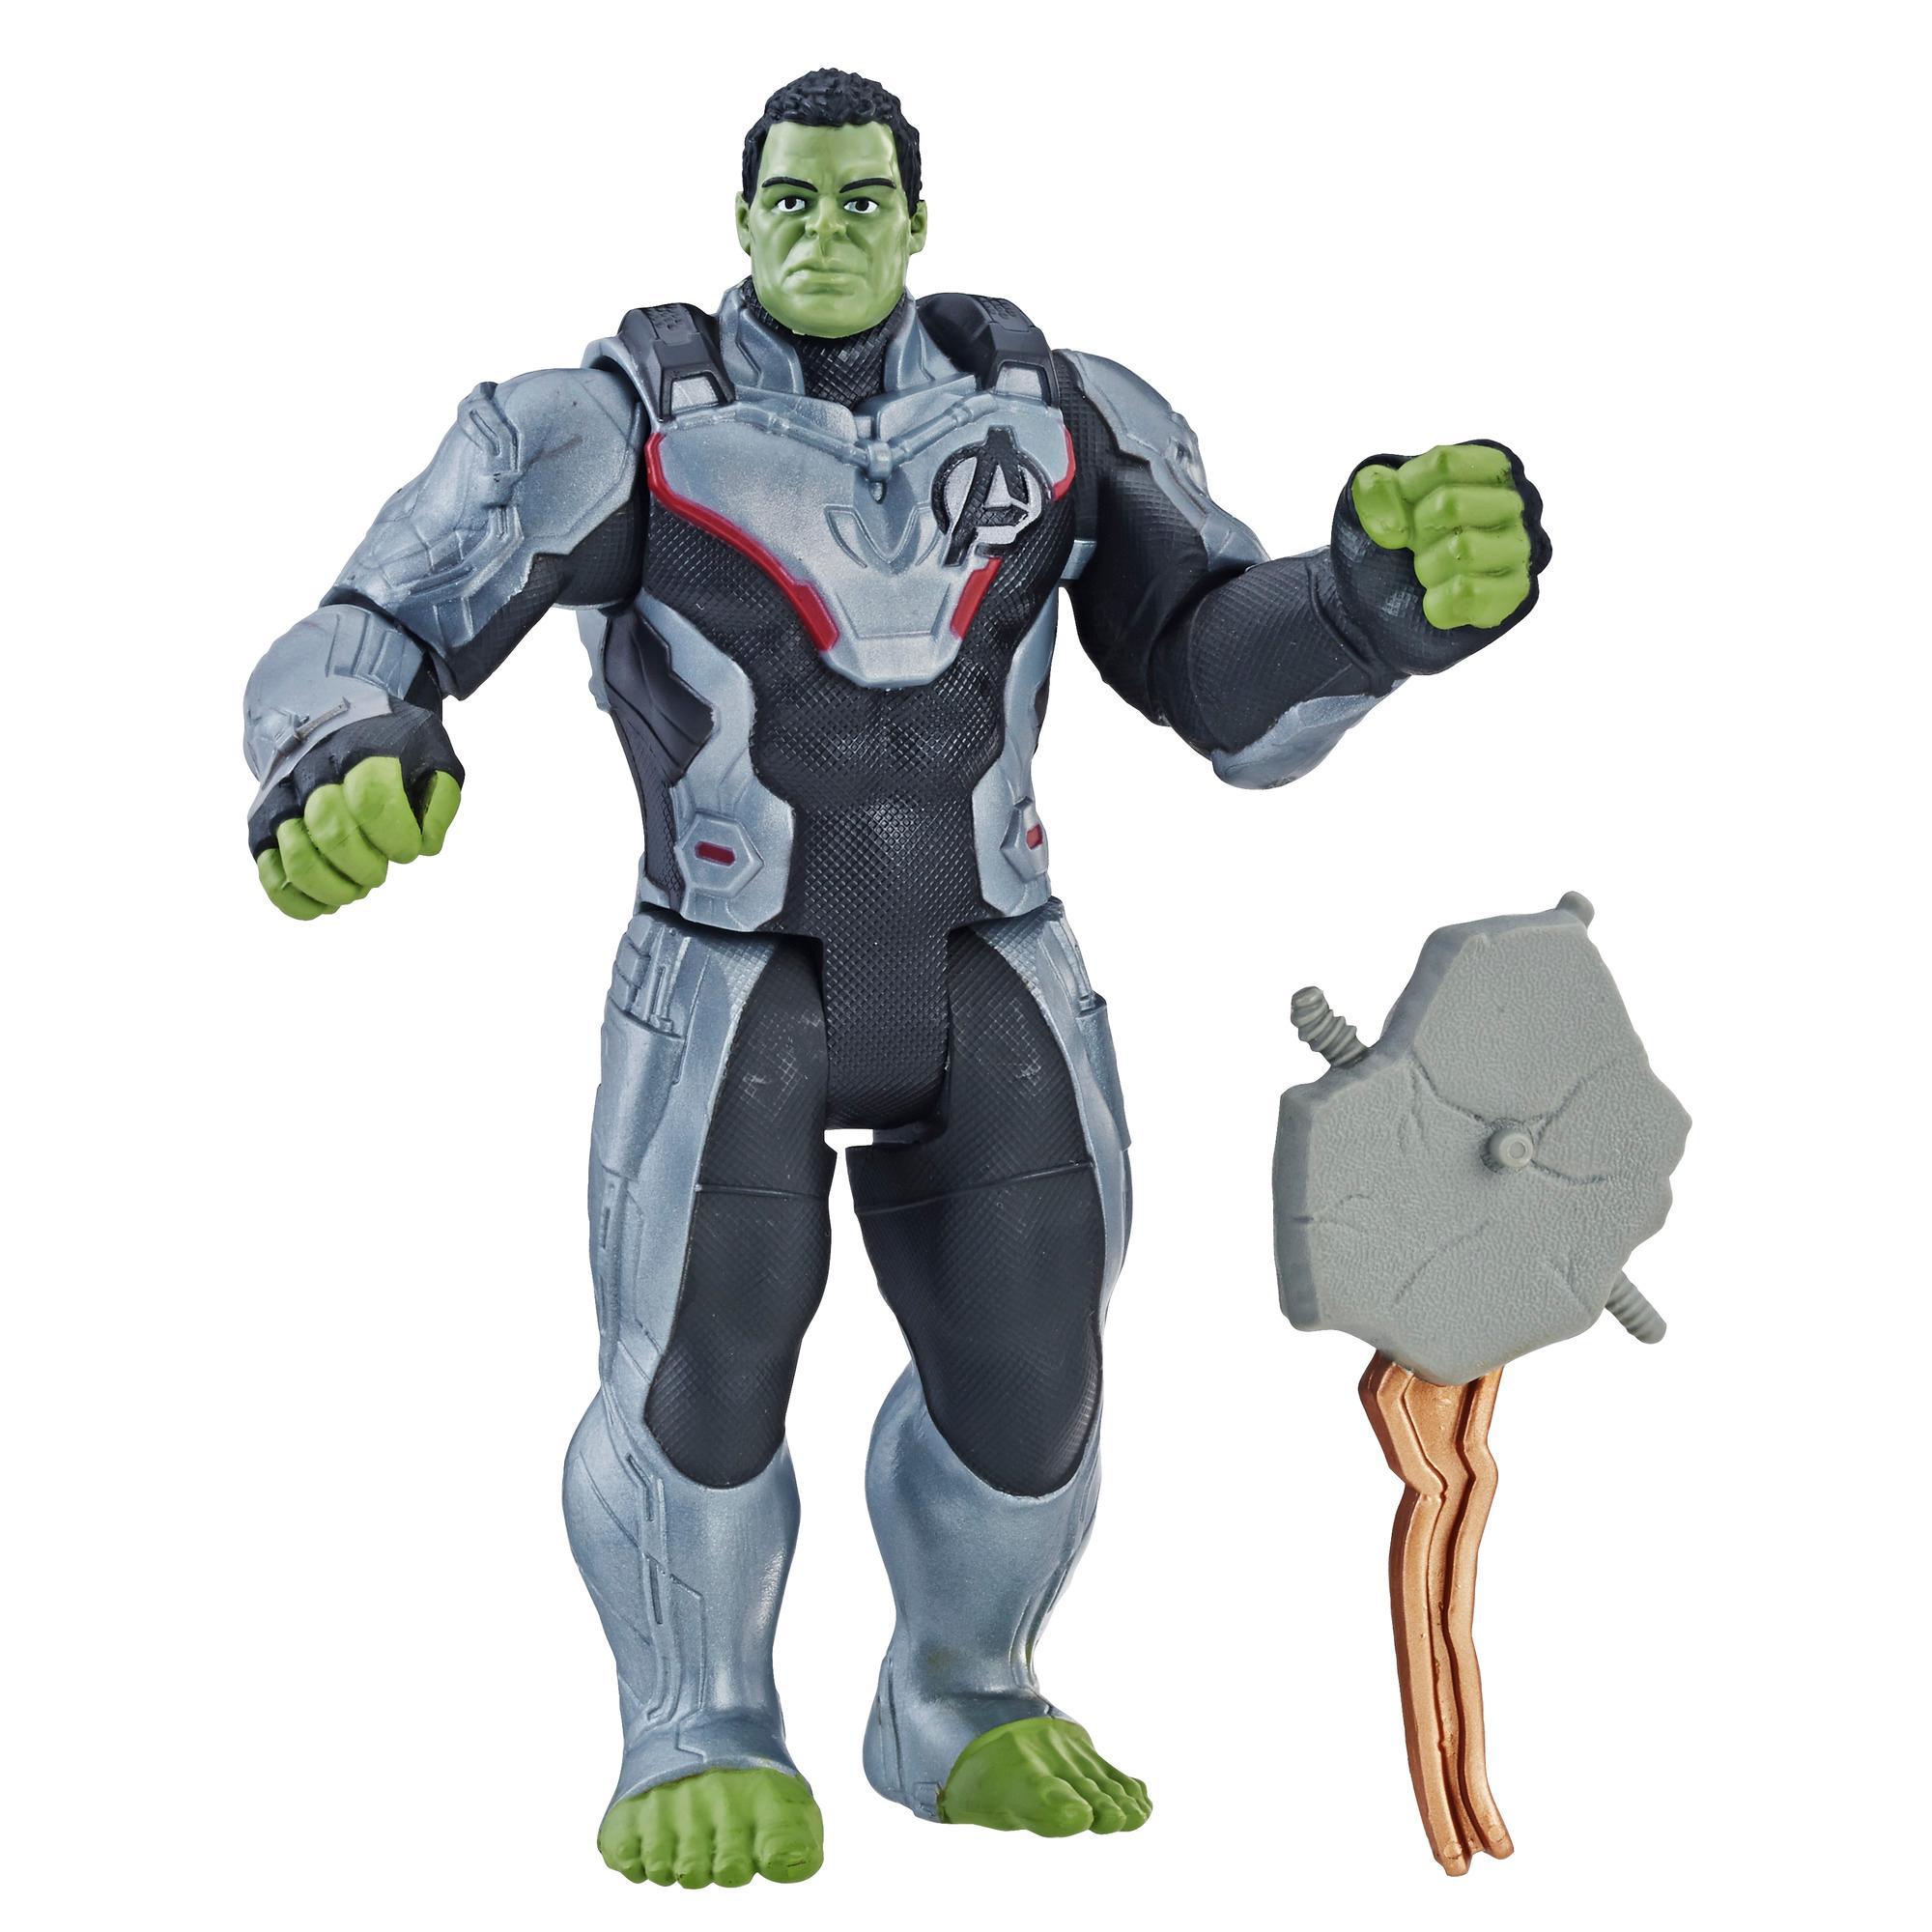 Marvel Avengers: Endgame - Figura de lujo de Hulk con traje del equipo del Universo Cinematográfico de Marvel